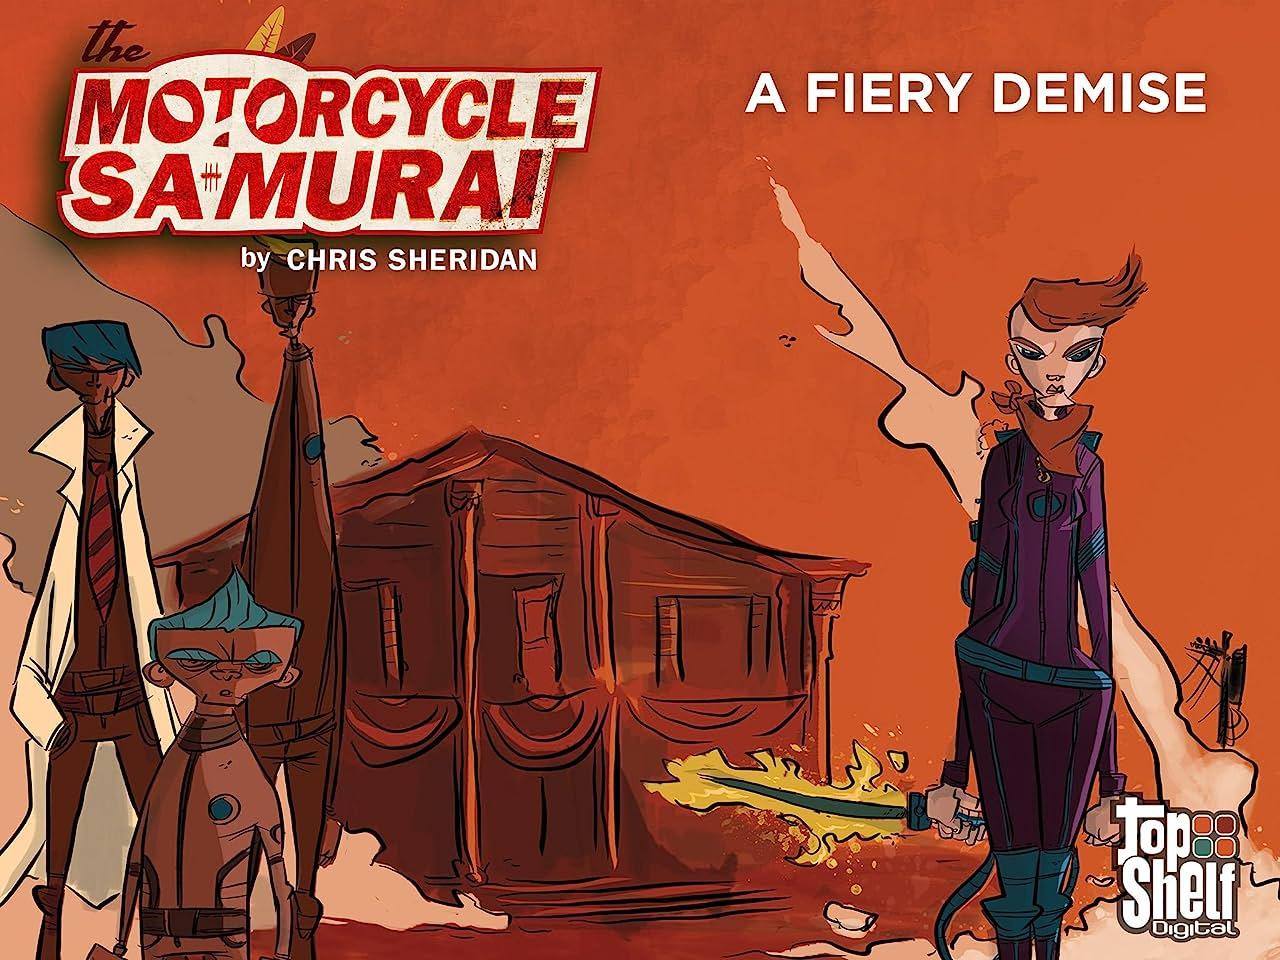 Motorcycle Samurai #5: A Fiery Demise